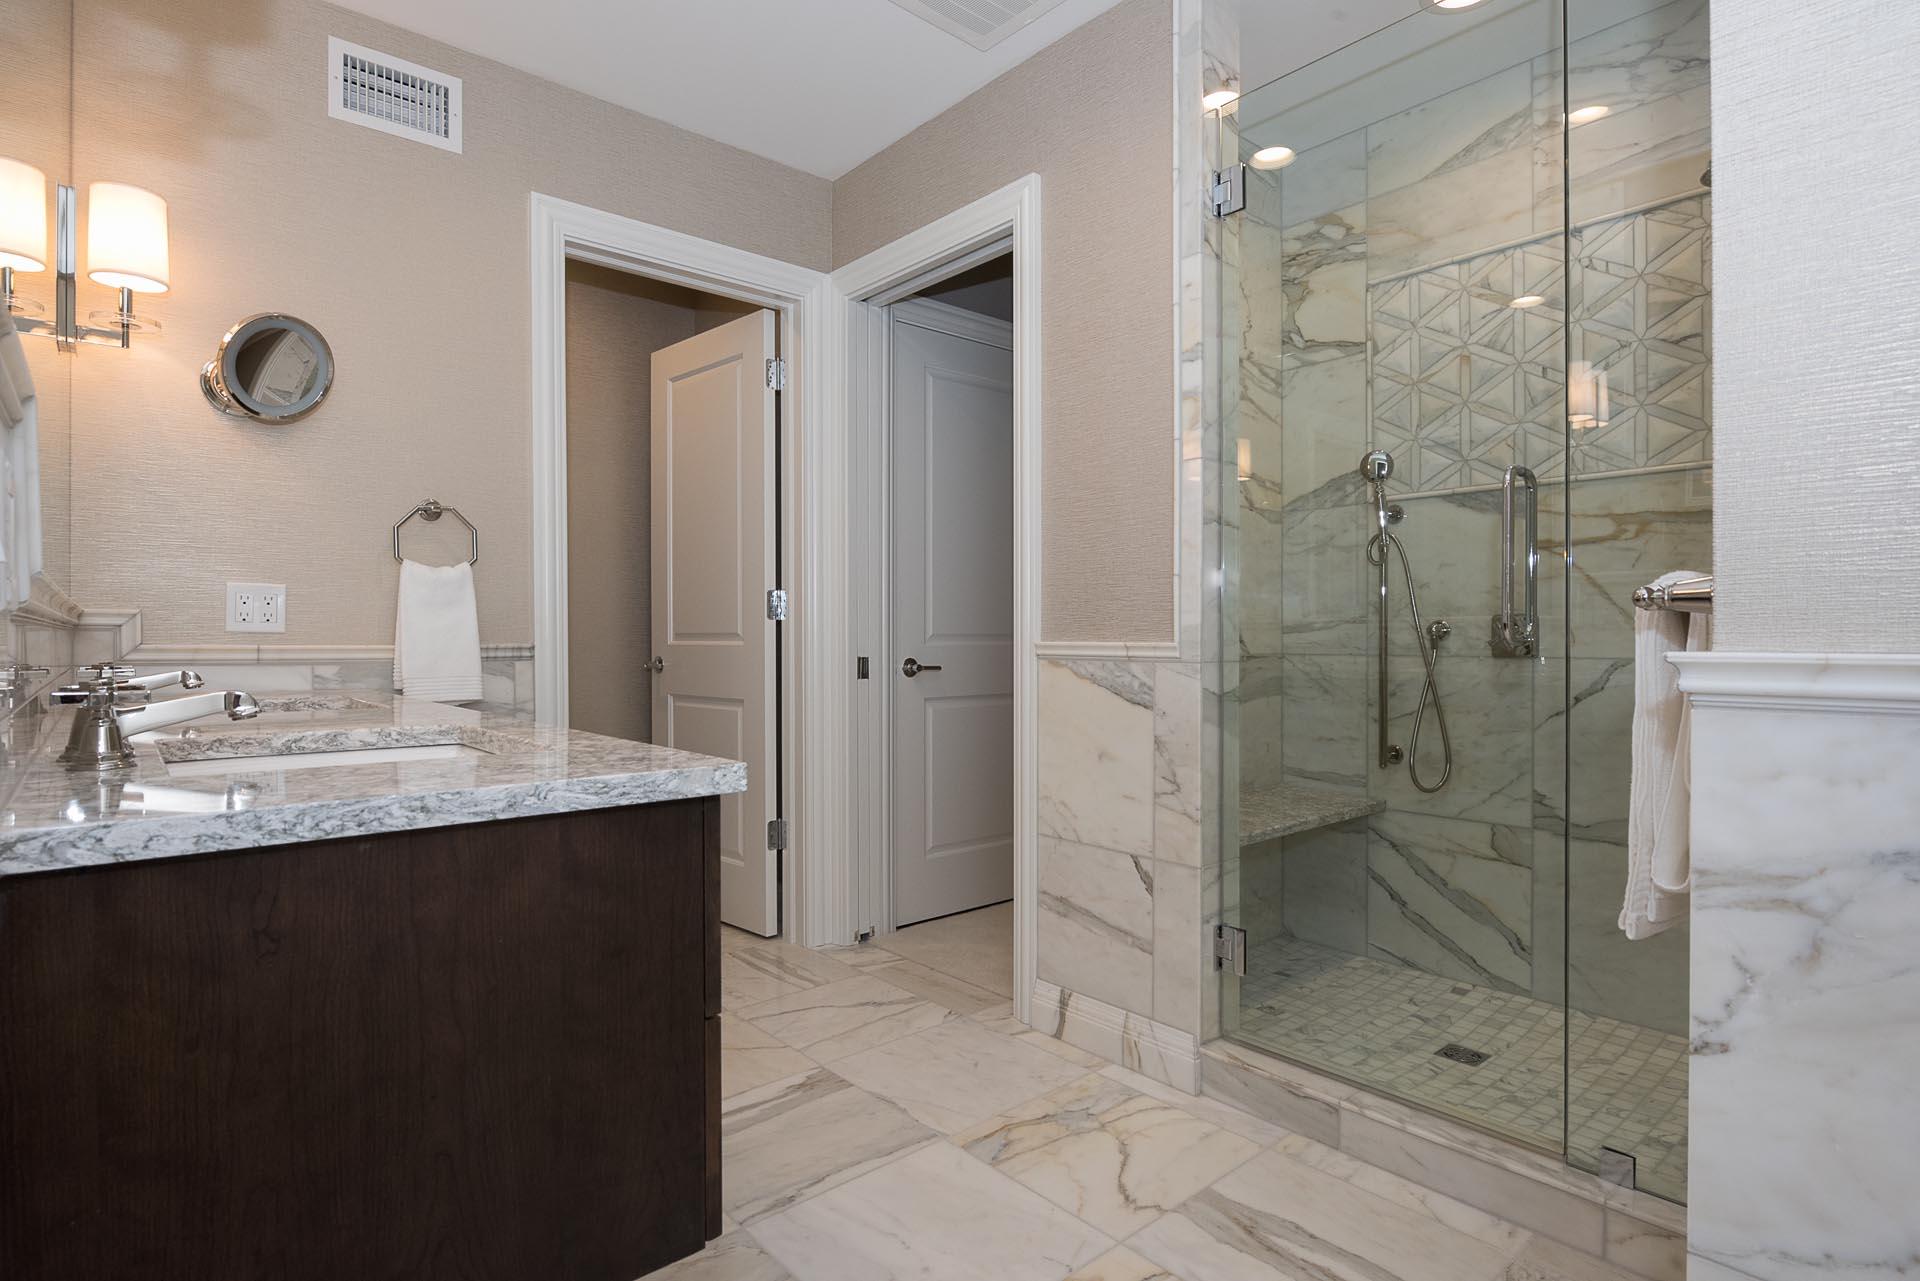 Condo Bathroom Design | H Residence | Midland, MI